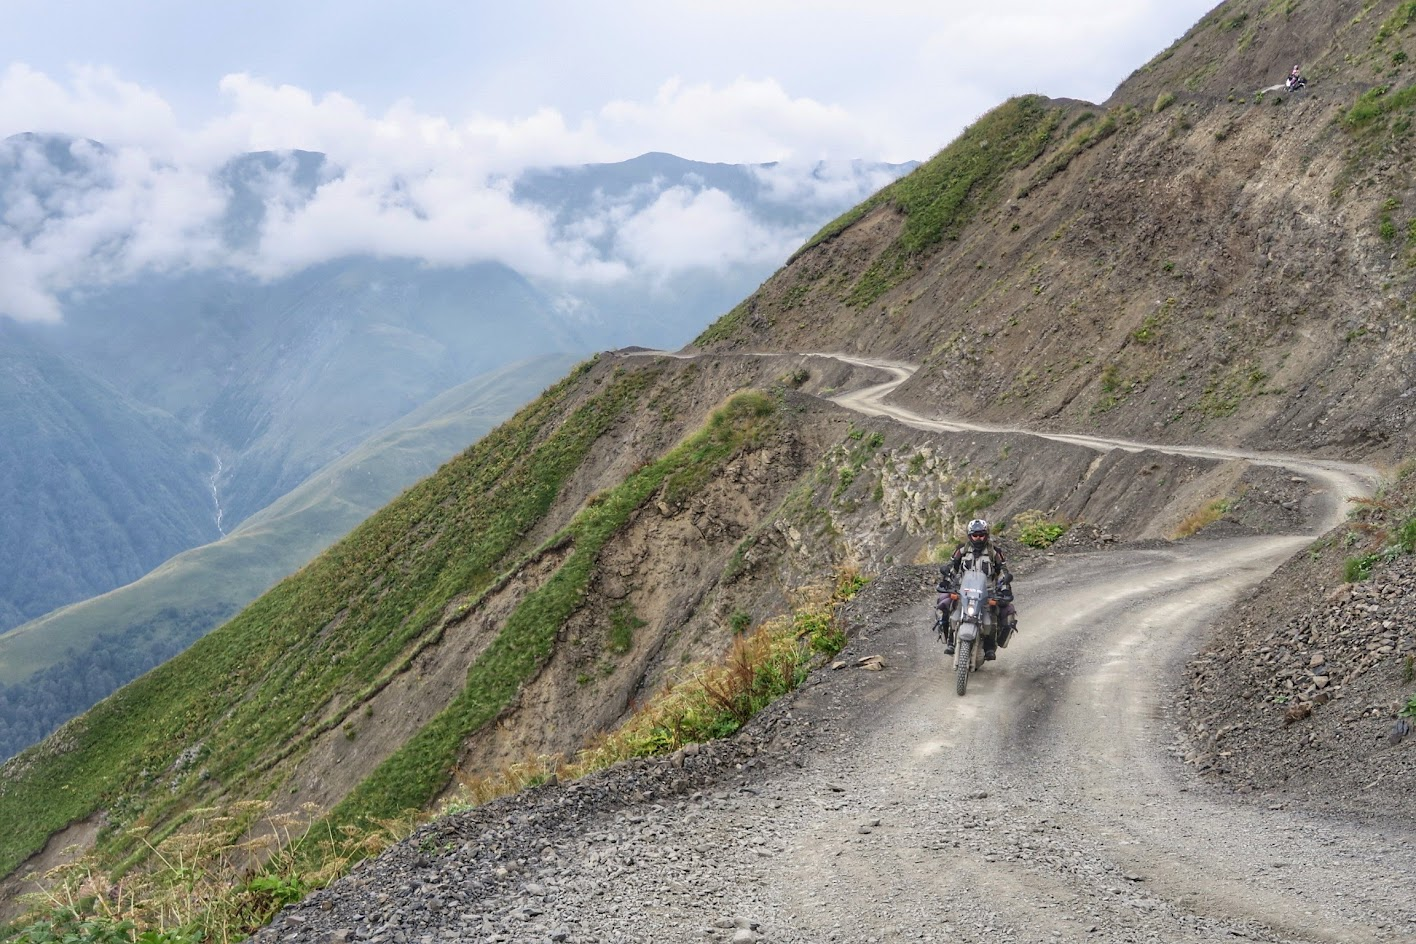 motocyklem do Gruzji